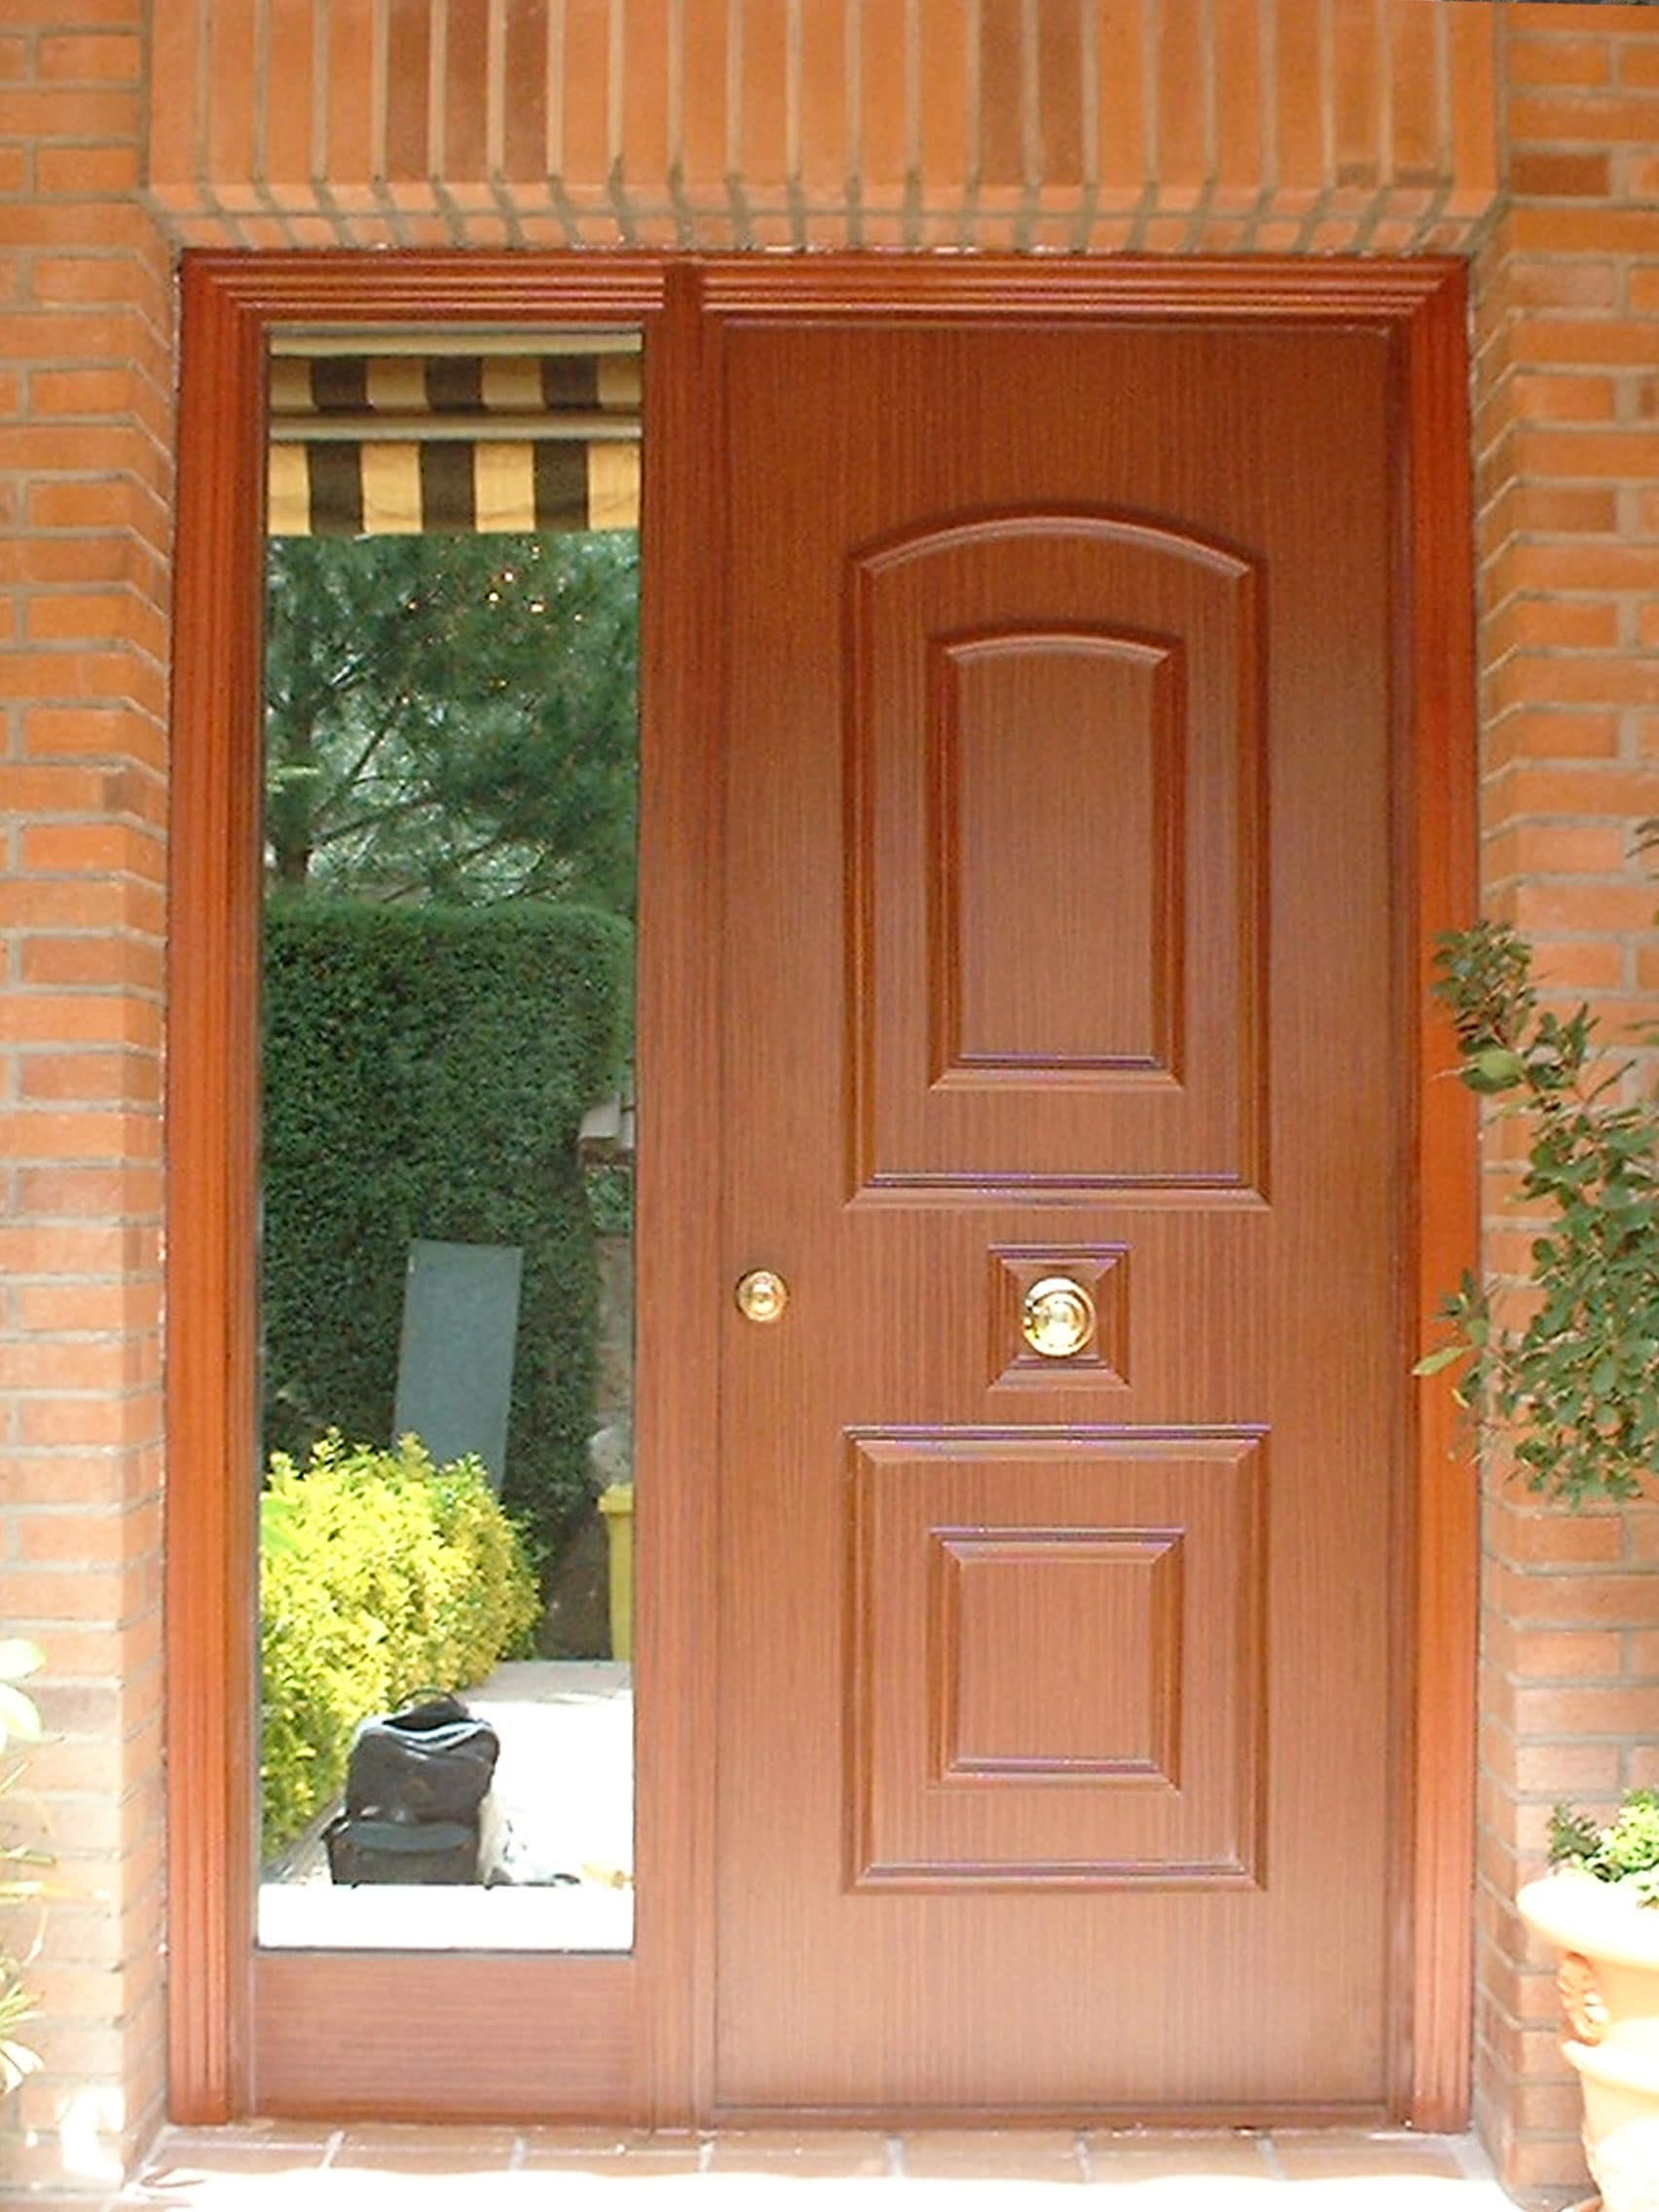 Puerta acorazada10 fichetmadrid - Puerta acorazada madrid ...